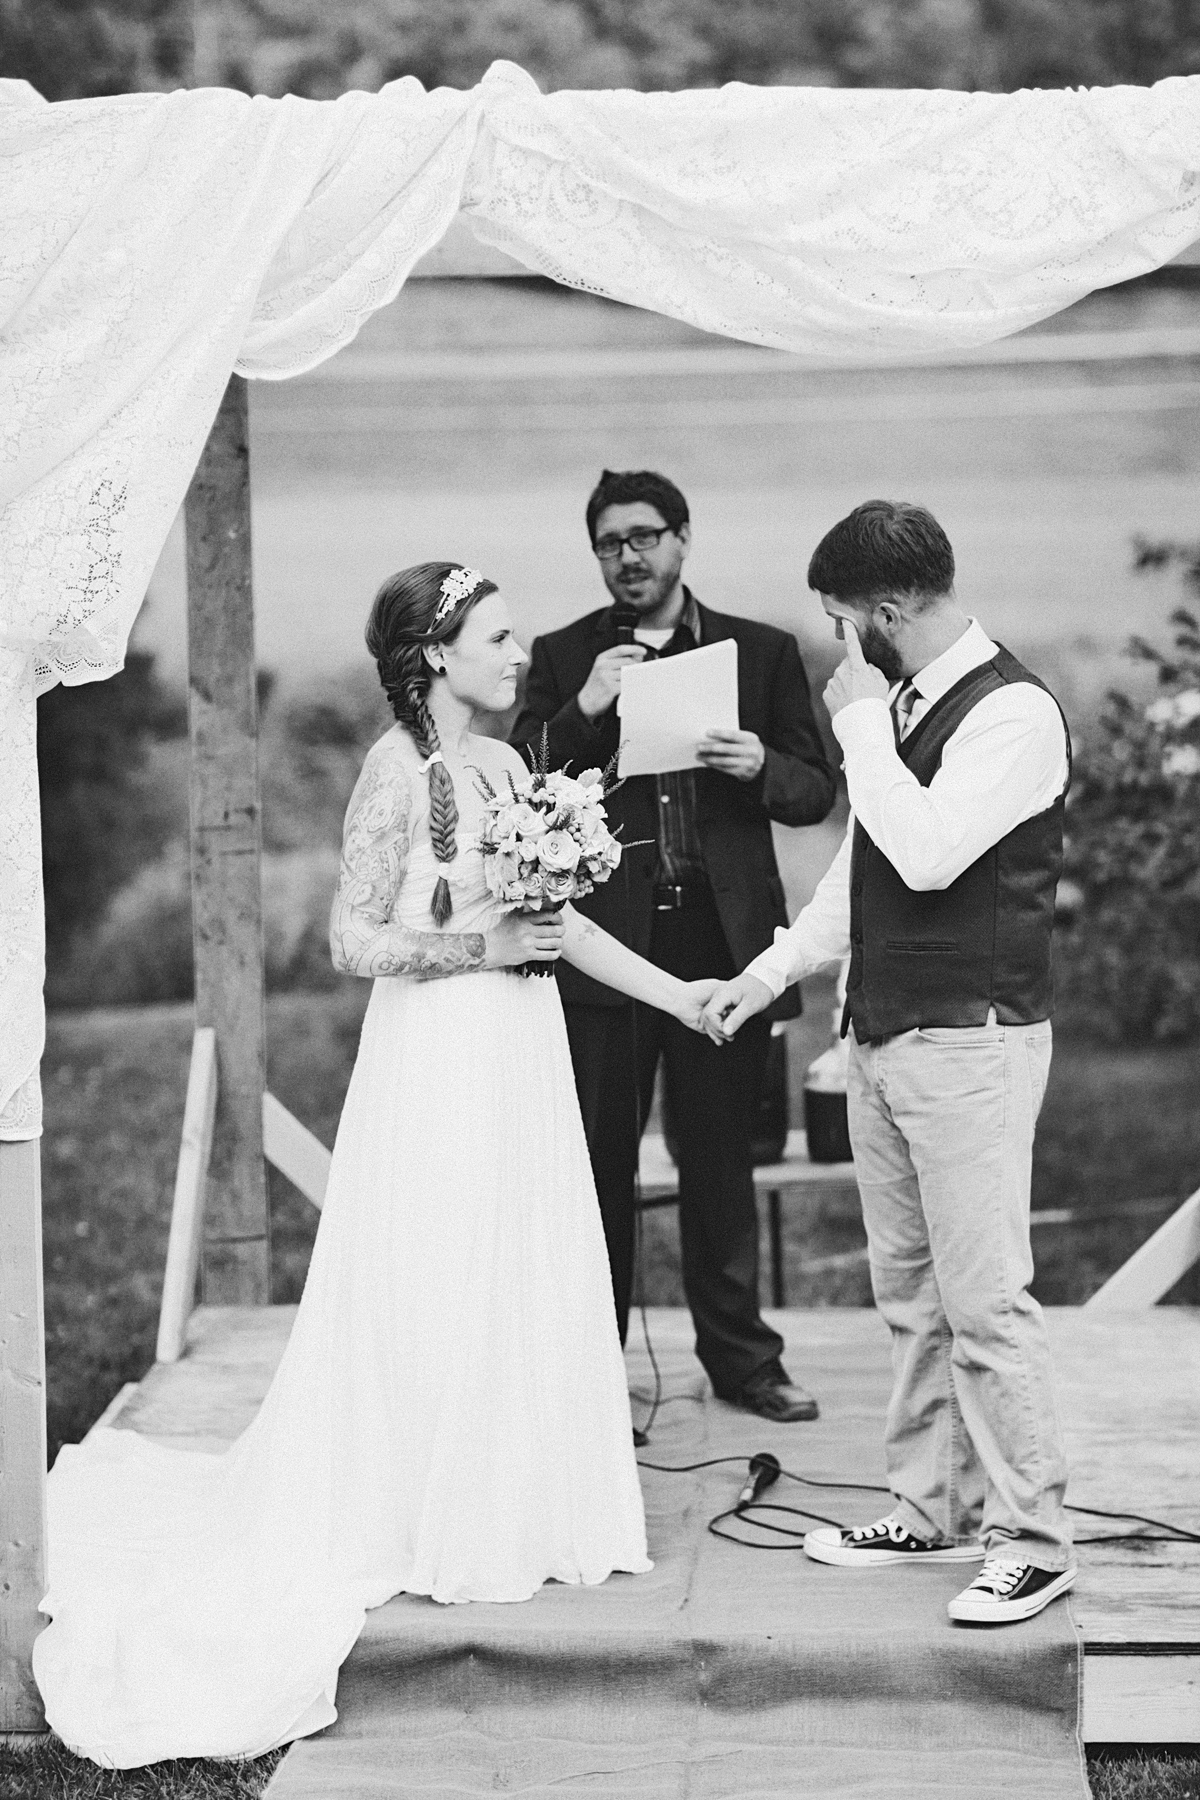 clewell-photography-minneapolis-farm-hunger-games-wedding-16.1.jpg